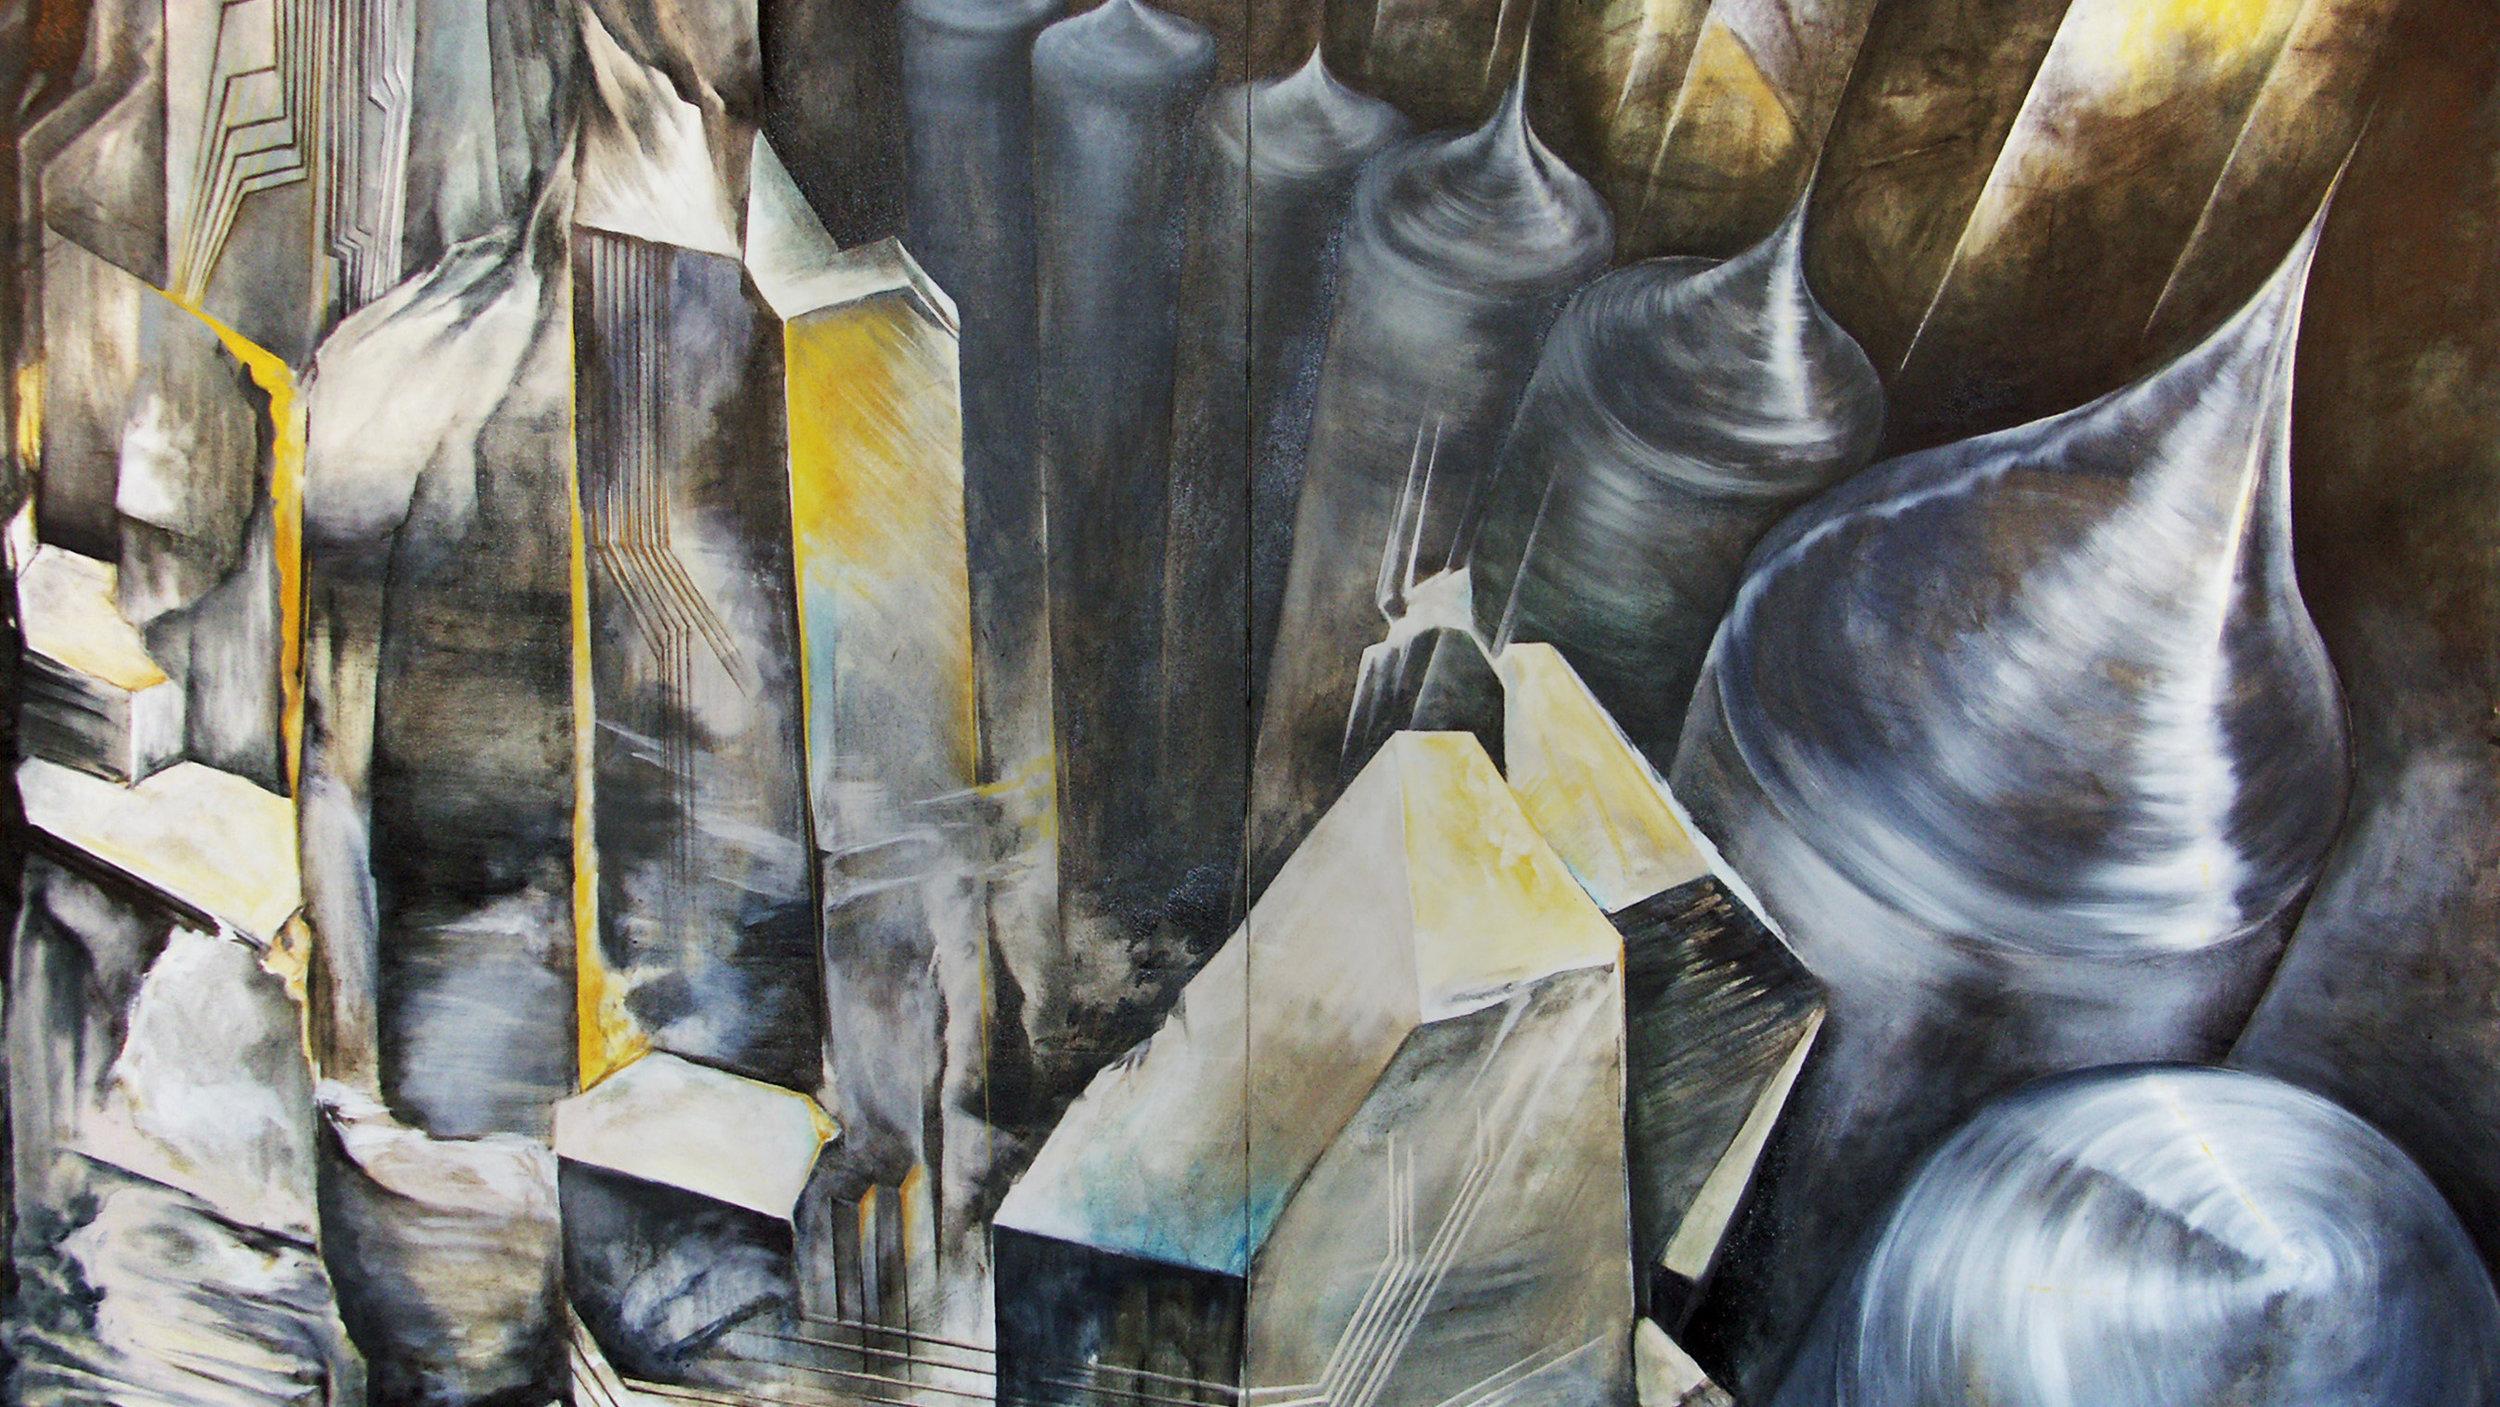 Hemlock Semiconductor - Bespoke Paintings